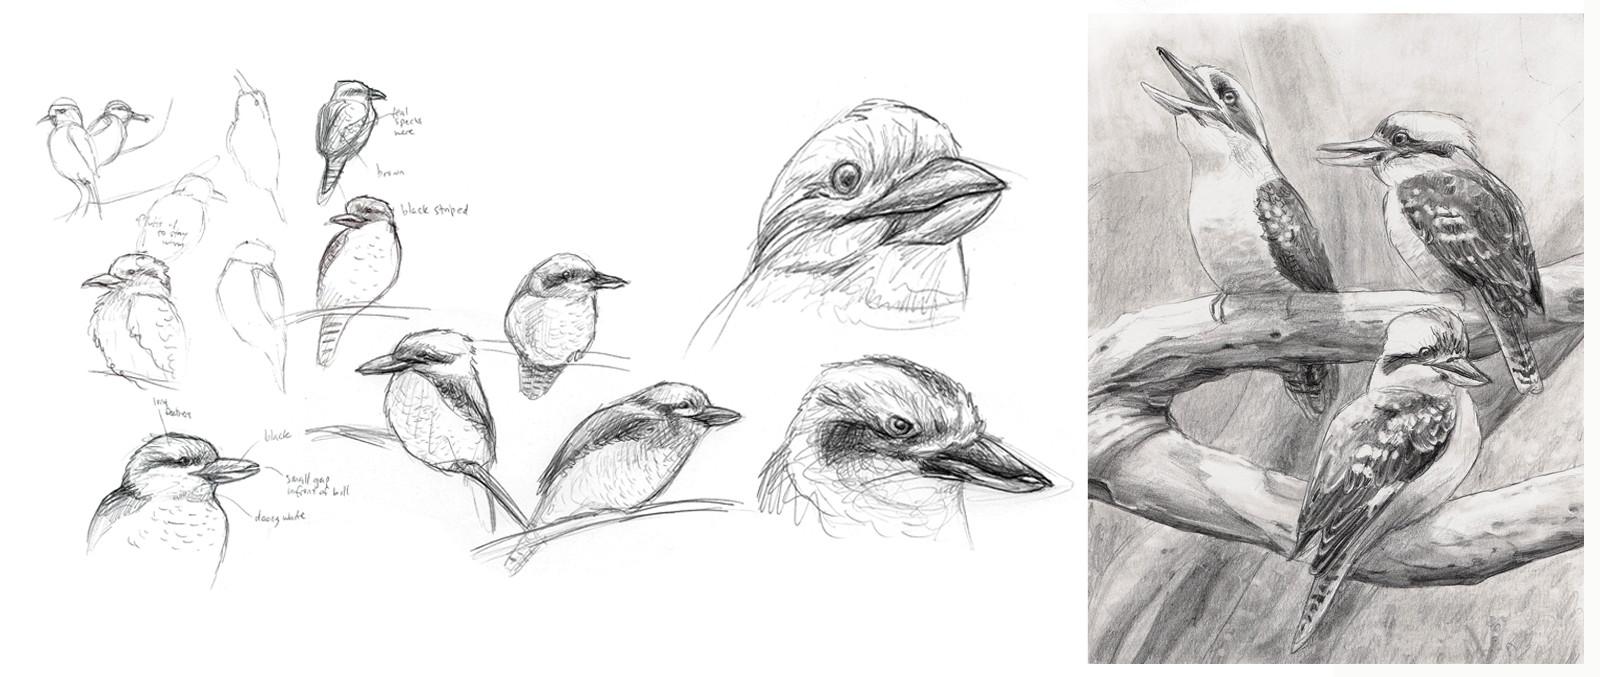 Alina godfrey kookaburra sketches